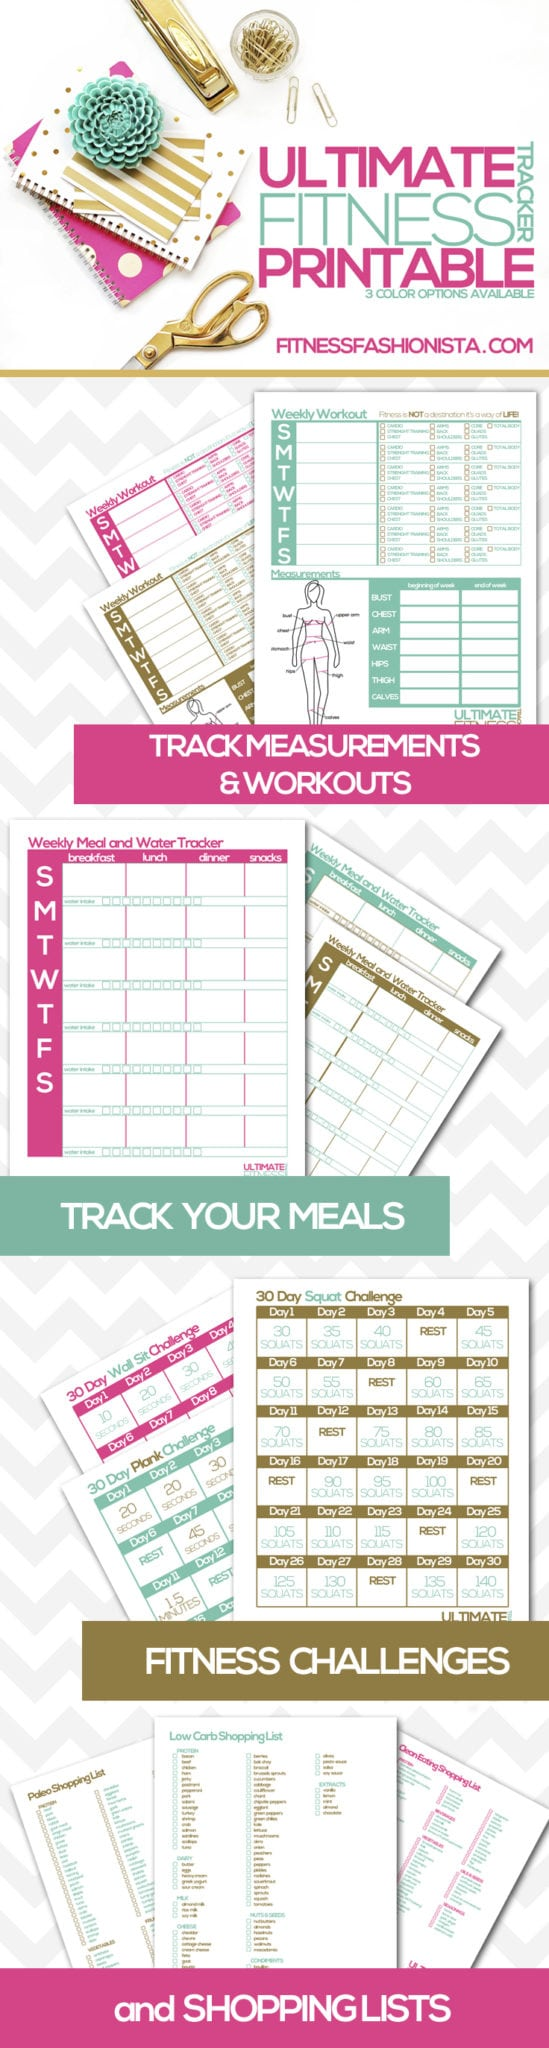 fitness tracker pinterest image copy